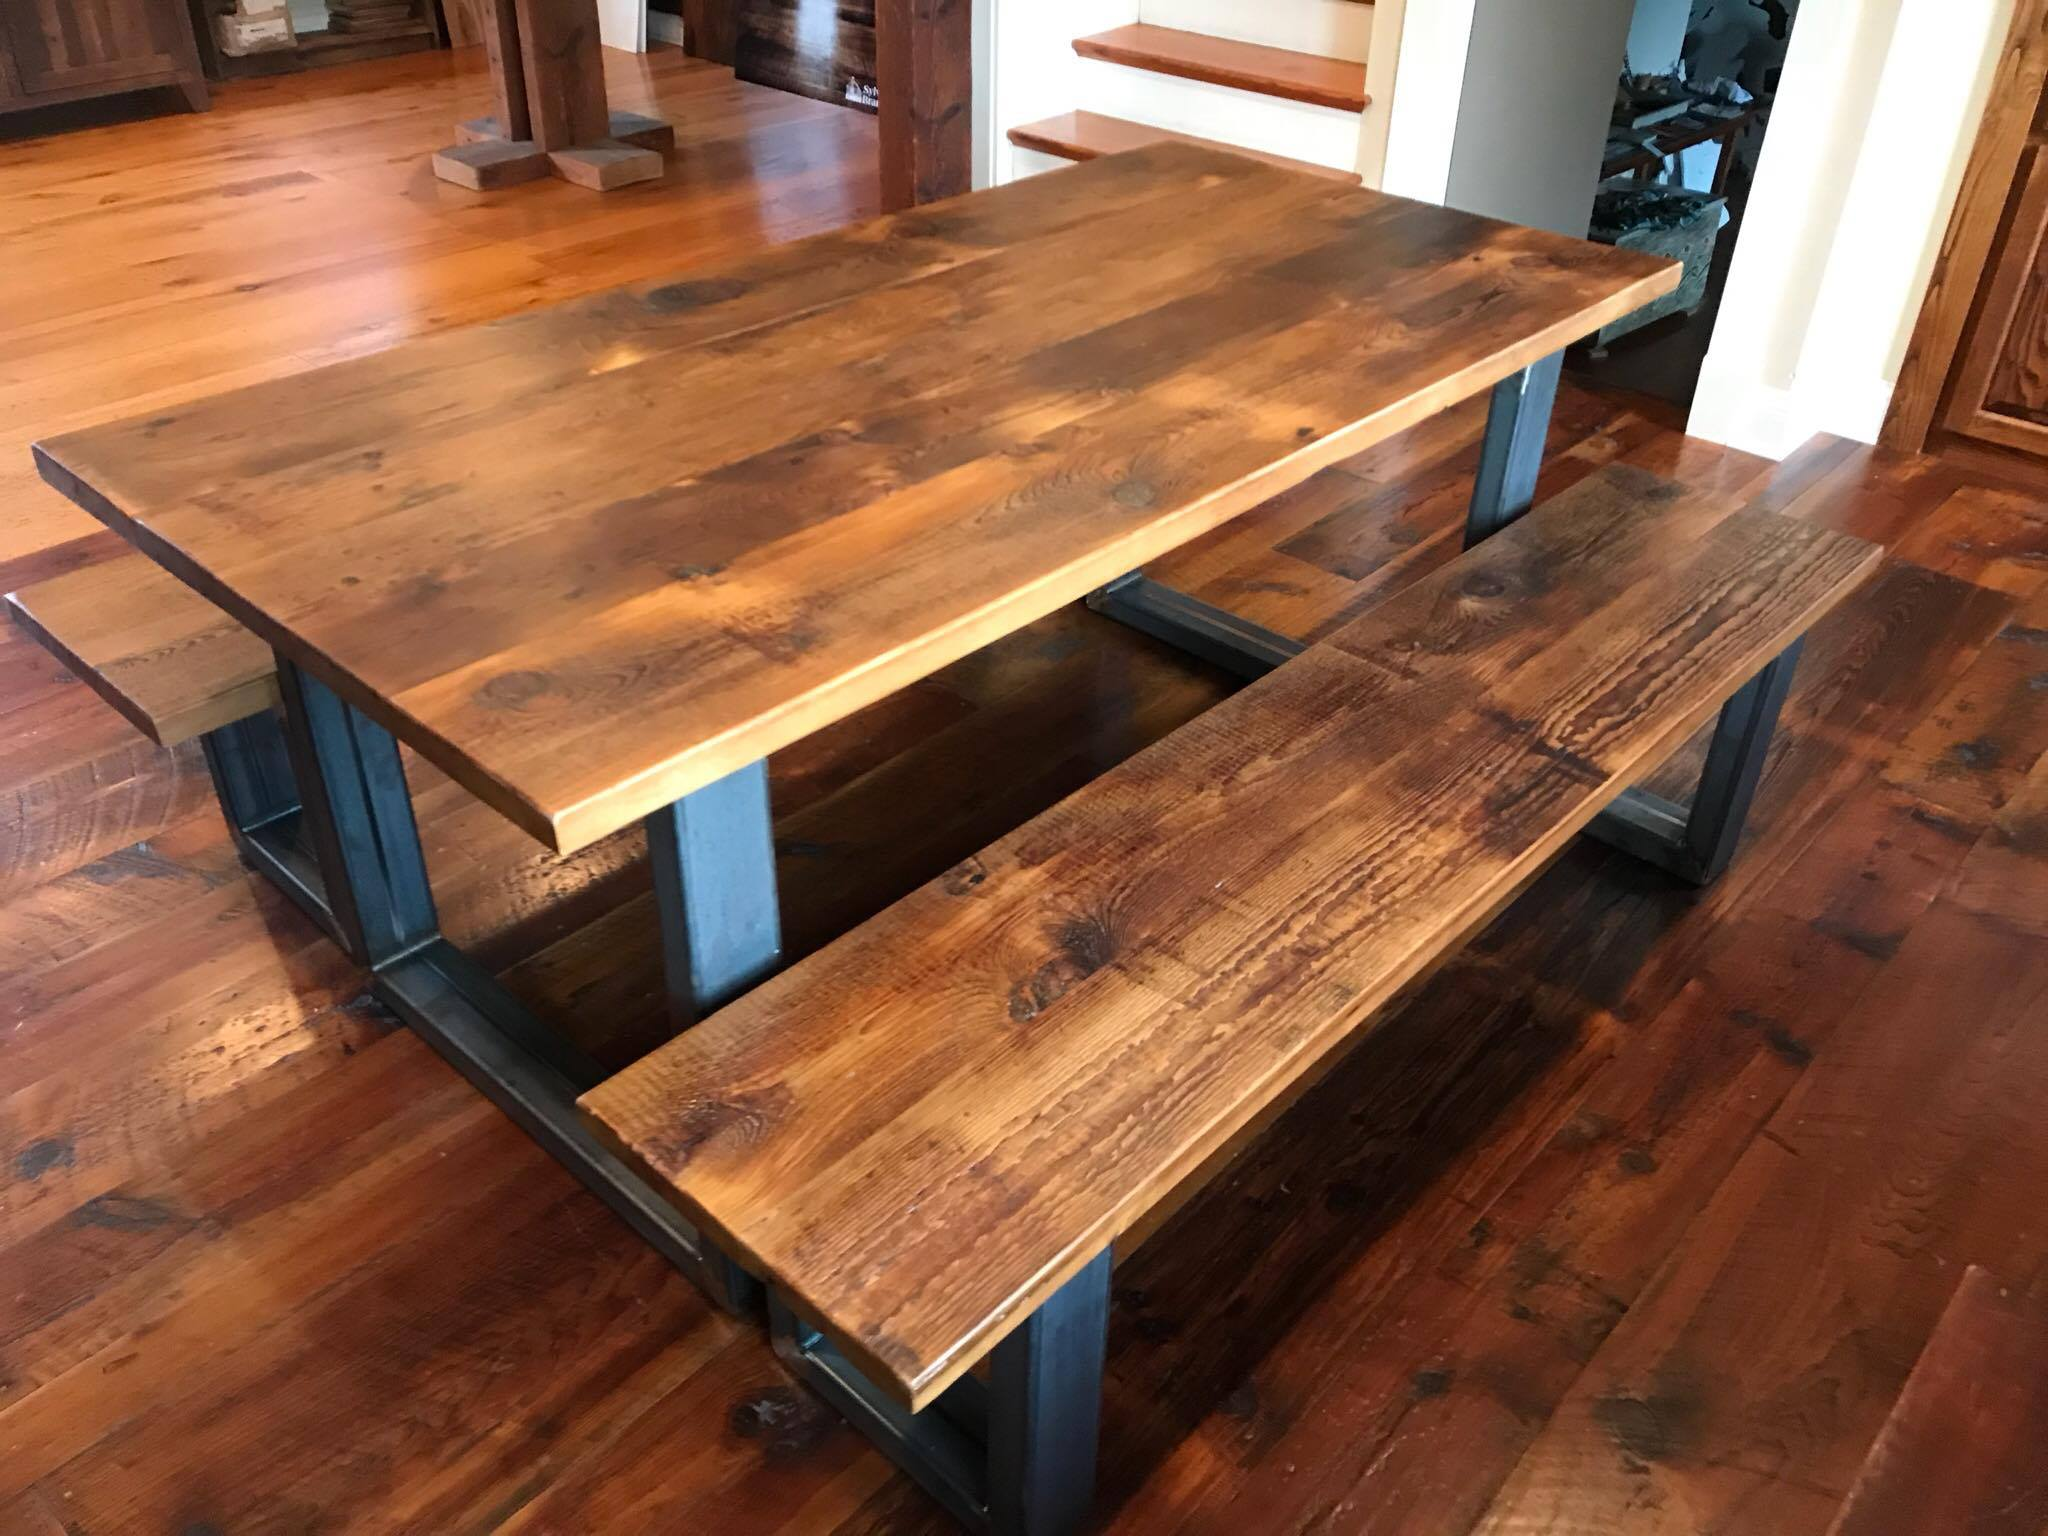 Marvelous Reclaimed Wood Plank Tables And Countertops Sylvan Brandt Ibusinesslaw Wood Chair Design Ideas Ibusinesslaworg